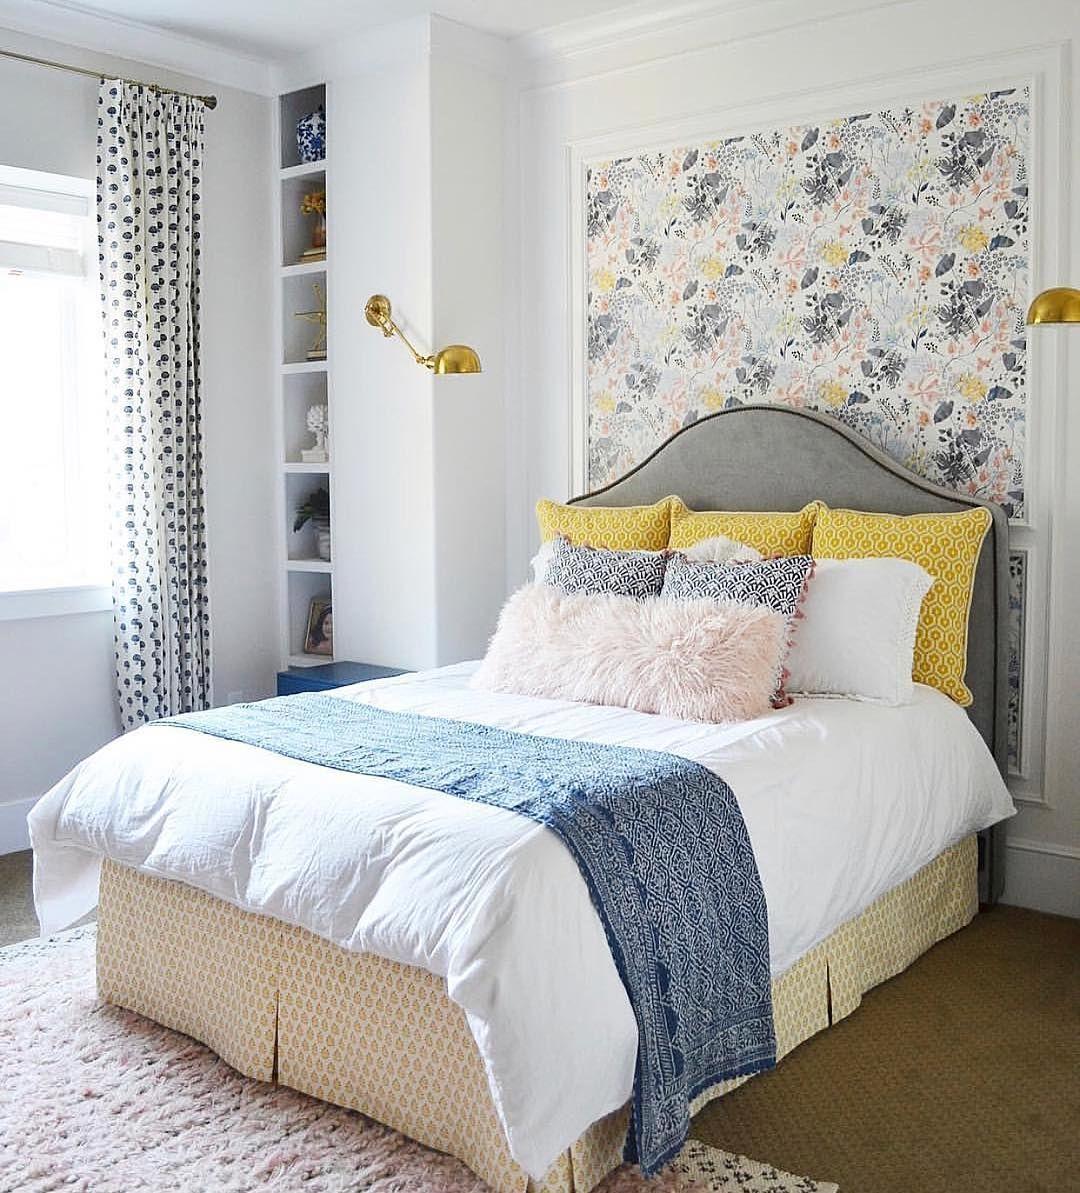 Best Furniture Store Barcelona Home Decor Online Bedroom